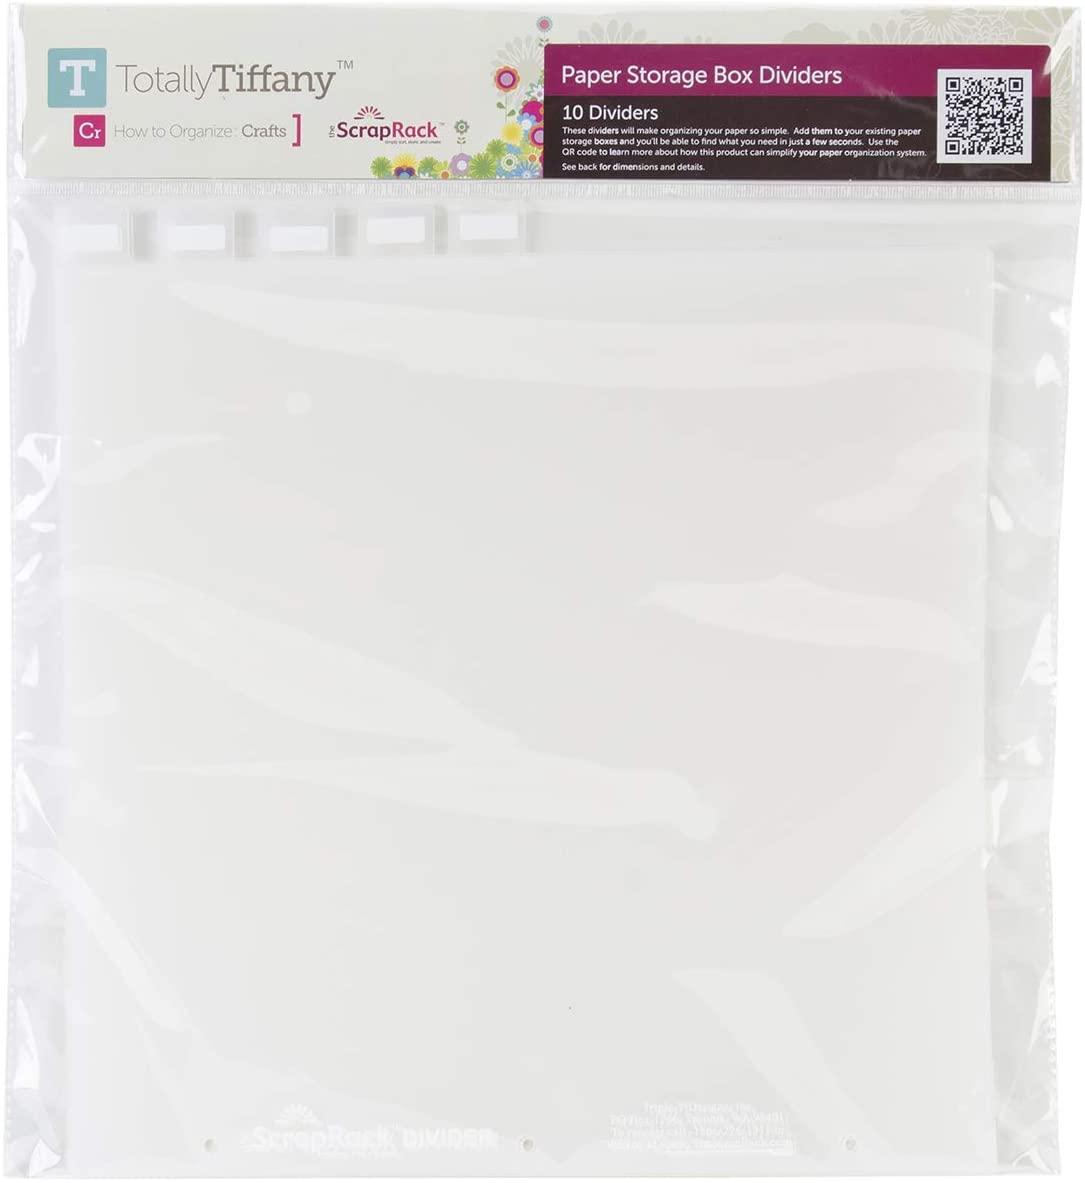 Totally Tiffany Paper Storage Box Divider 10pc